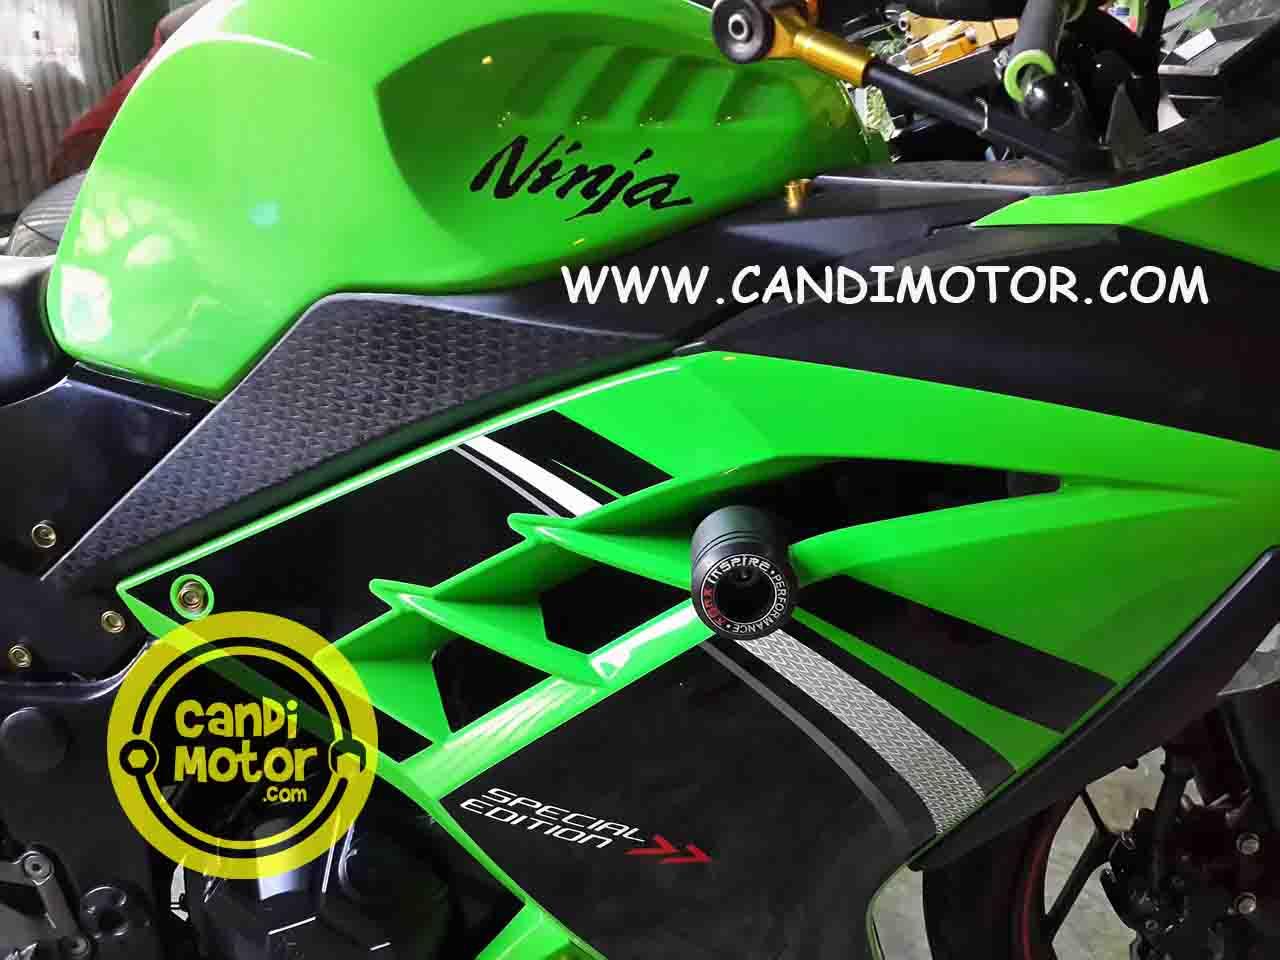 FRAME SLIDER PELINDUNG FAIRING NINJA 250 FI Z250 AGNA CANDI MOTOR 1 ...